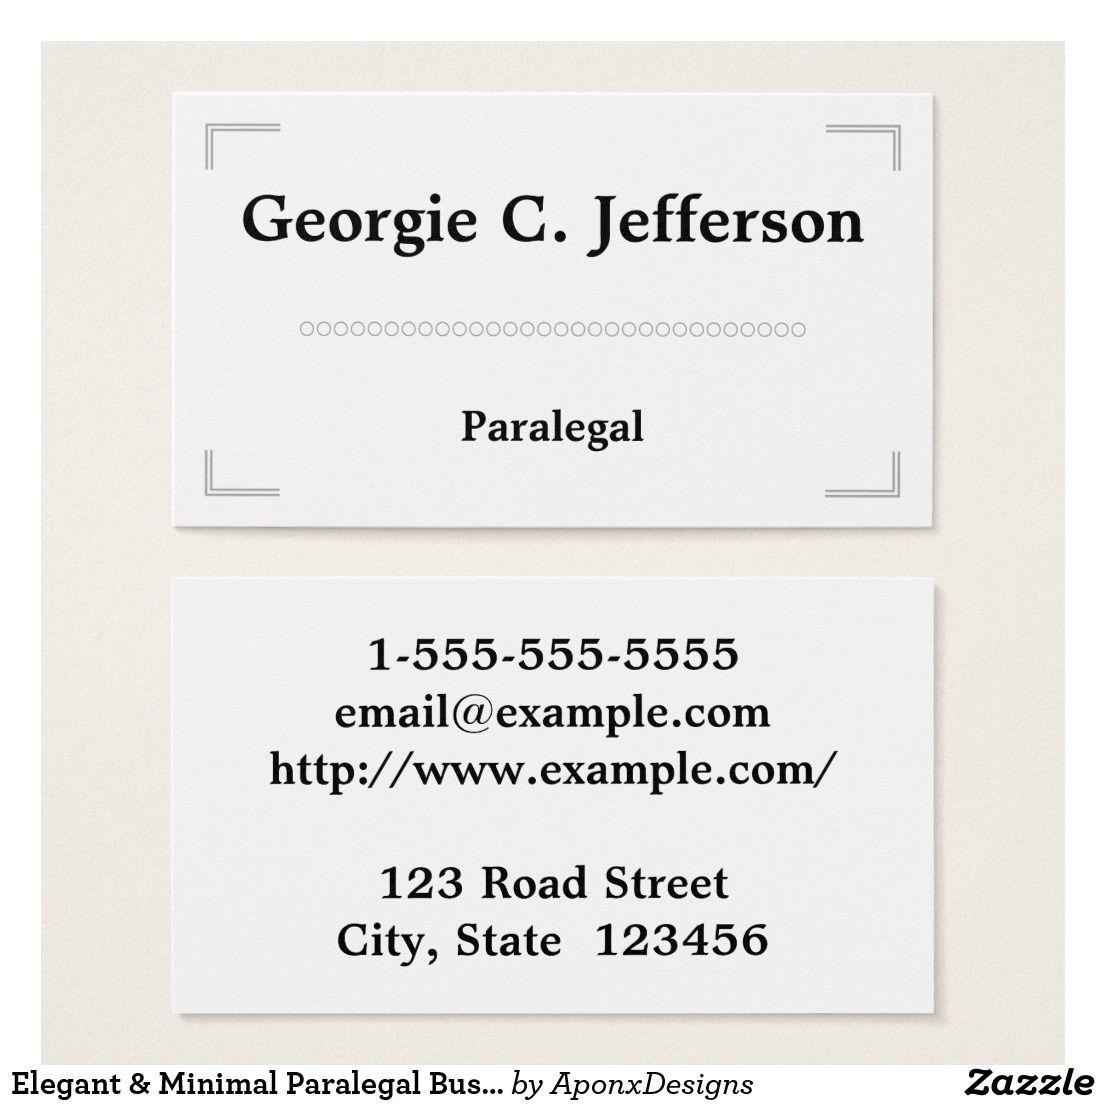 Elegant & Minimal Paralegal Business Card | Paralegal, Business ...